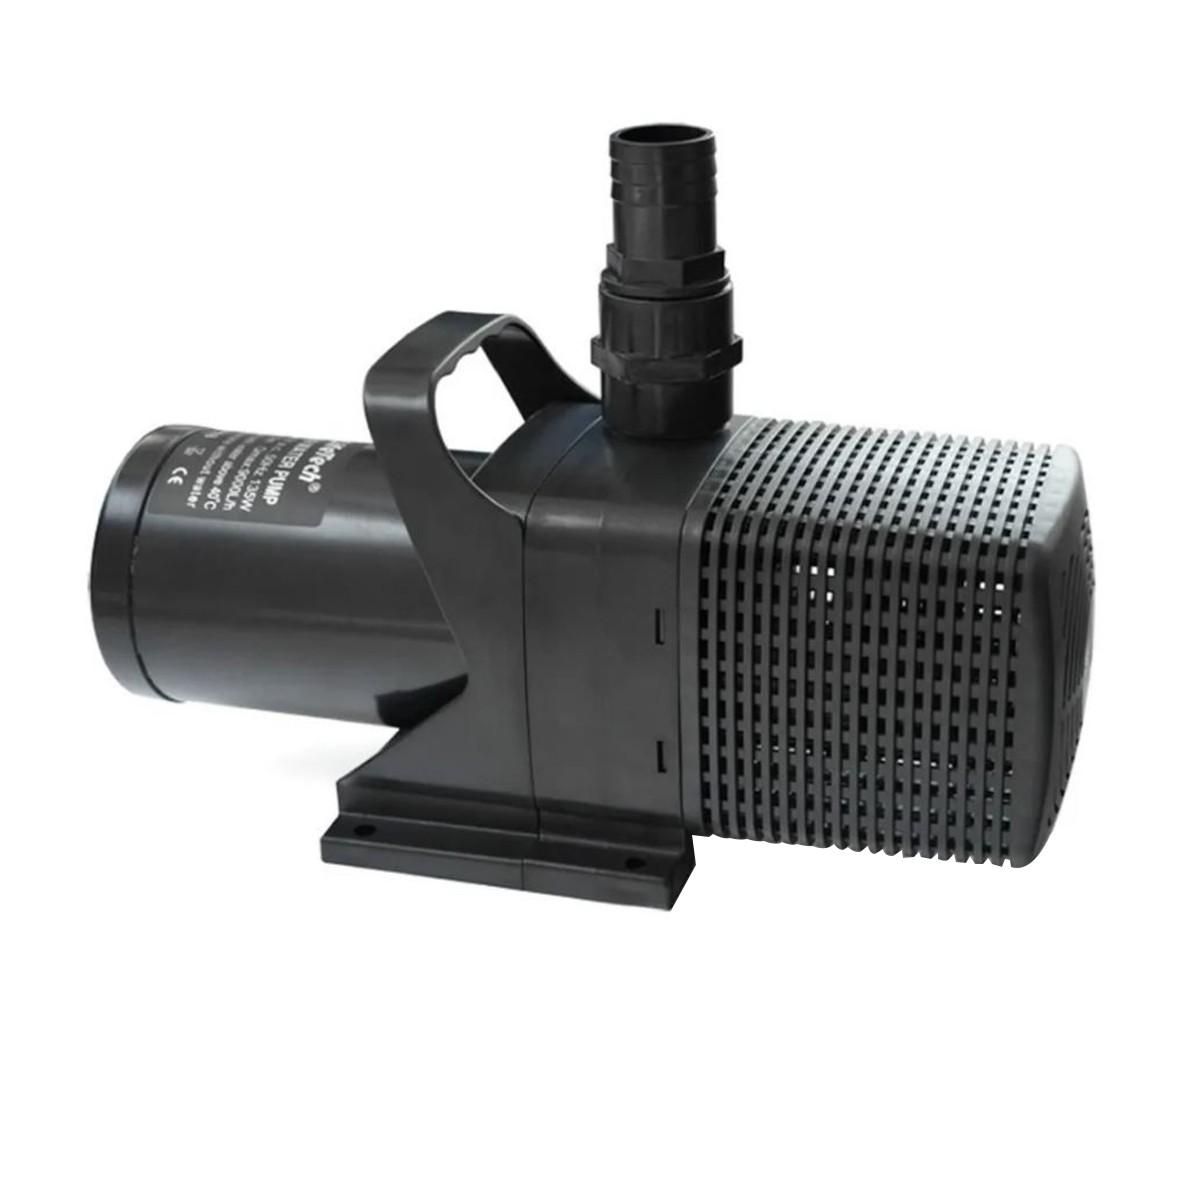 Bomba Submersa JAD SP610 para Lagos e Fontes - 10000 L/H